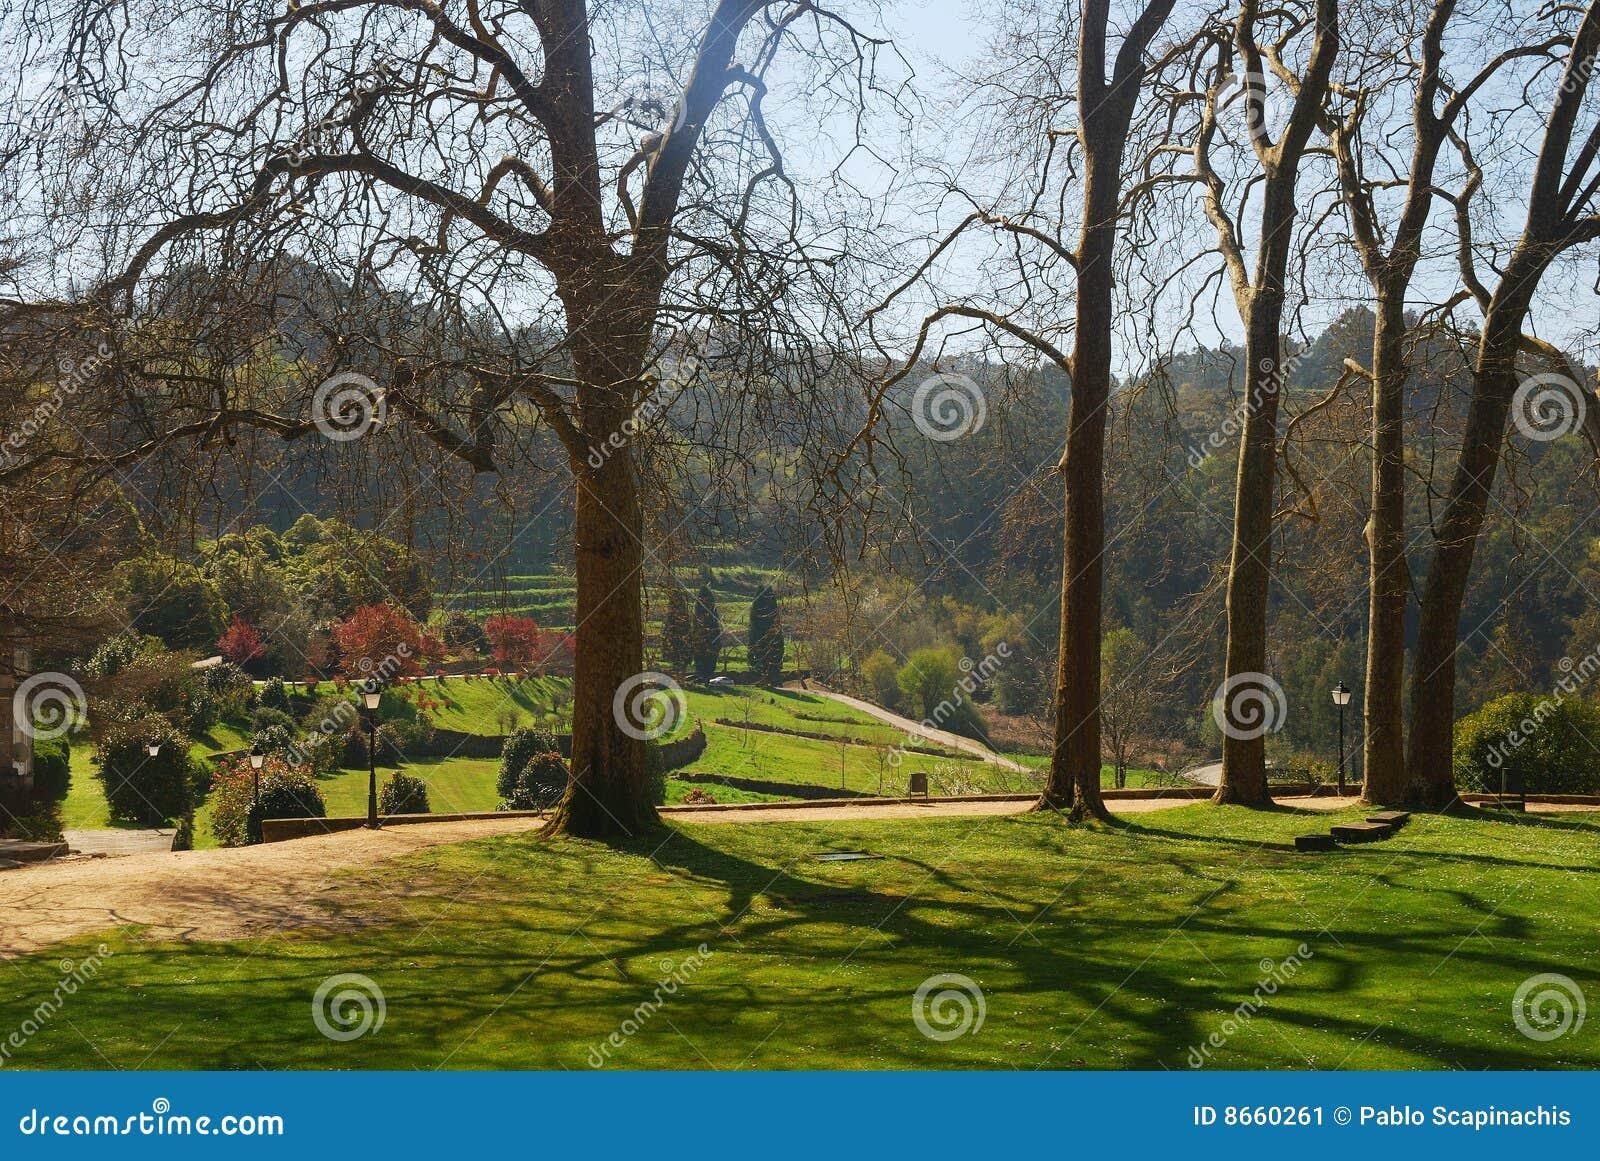 Jardins et chemin